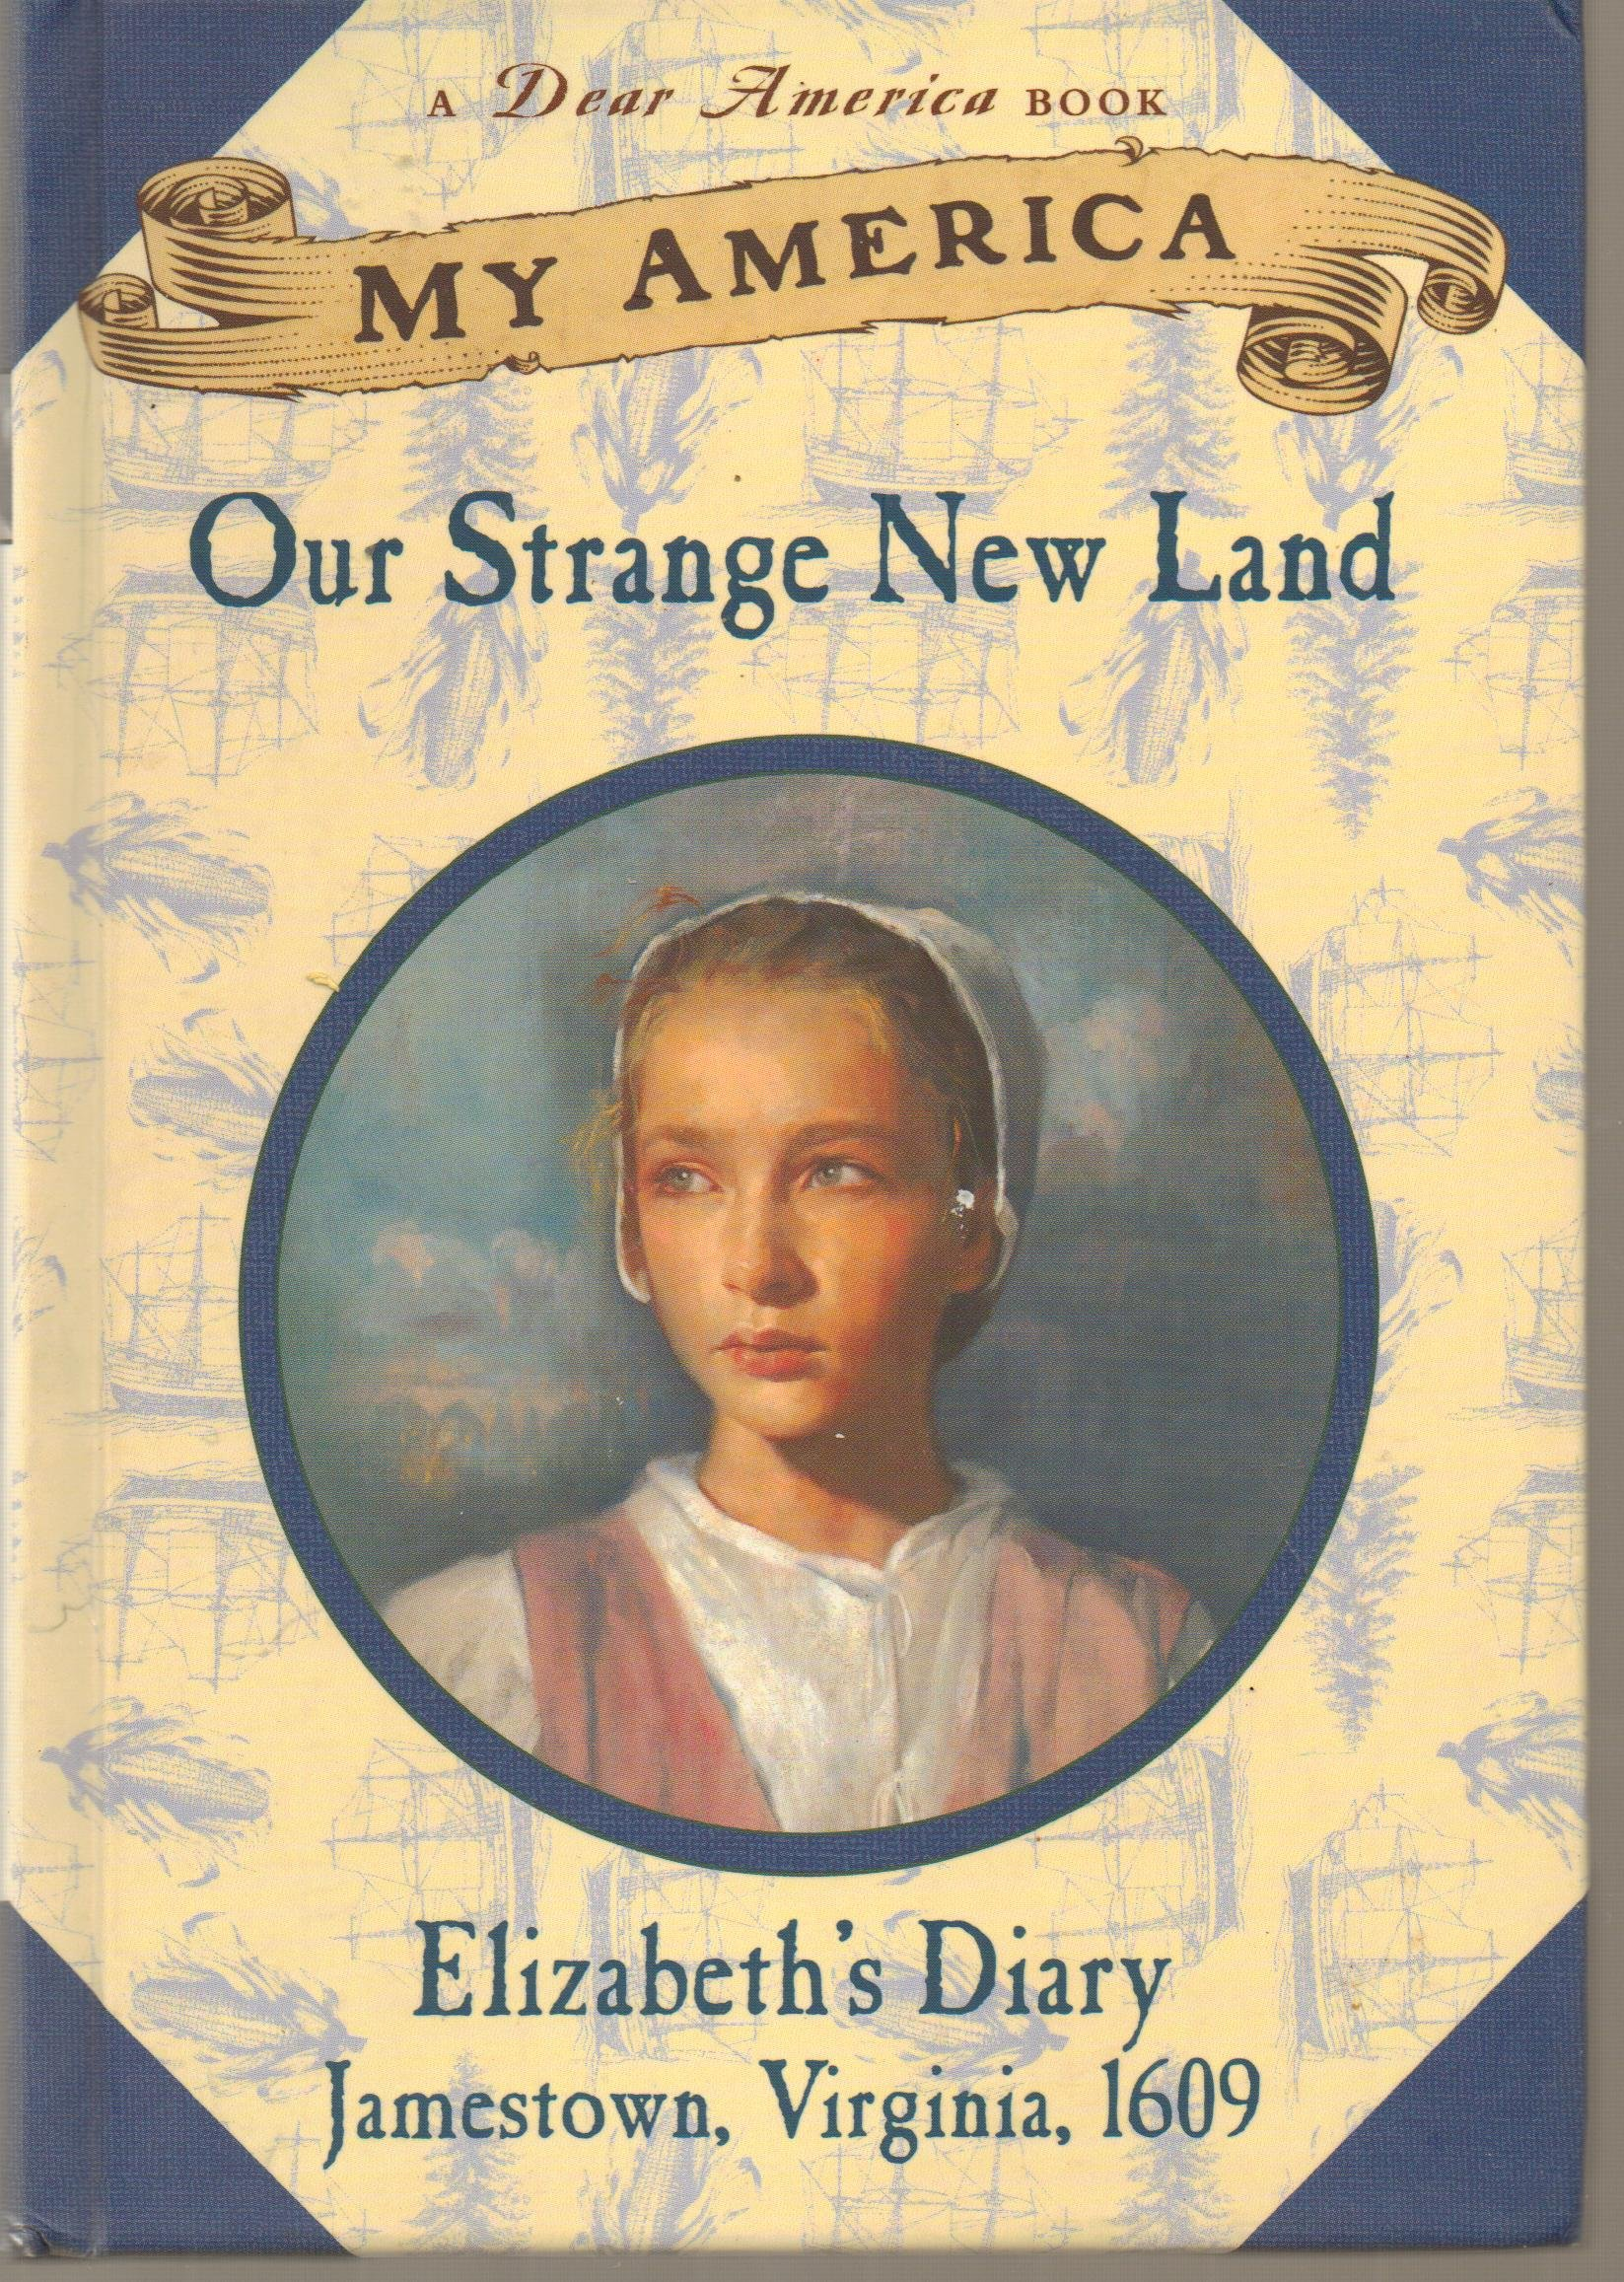 Download DEAR AMERICA - MY AMERICA - OUR STRANGE NEW LAND - ELIZABETH'S DIARY PDF